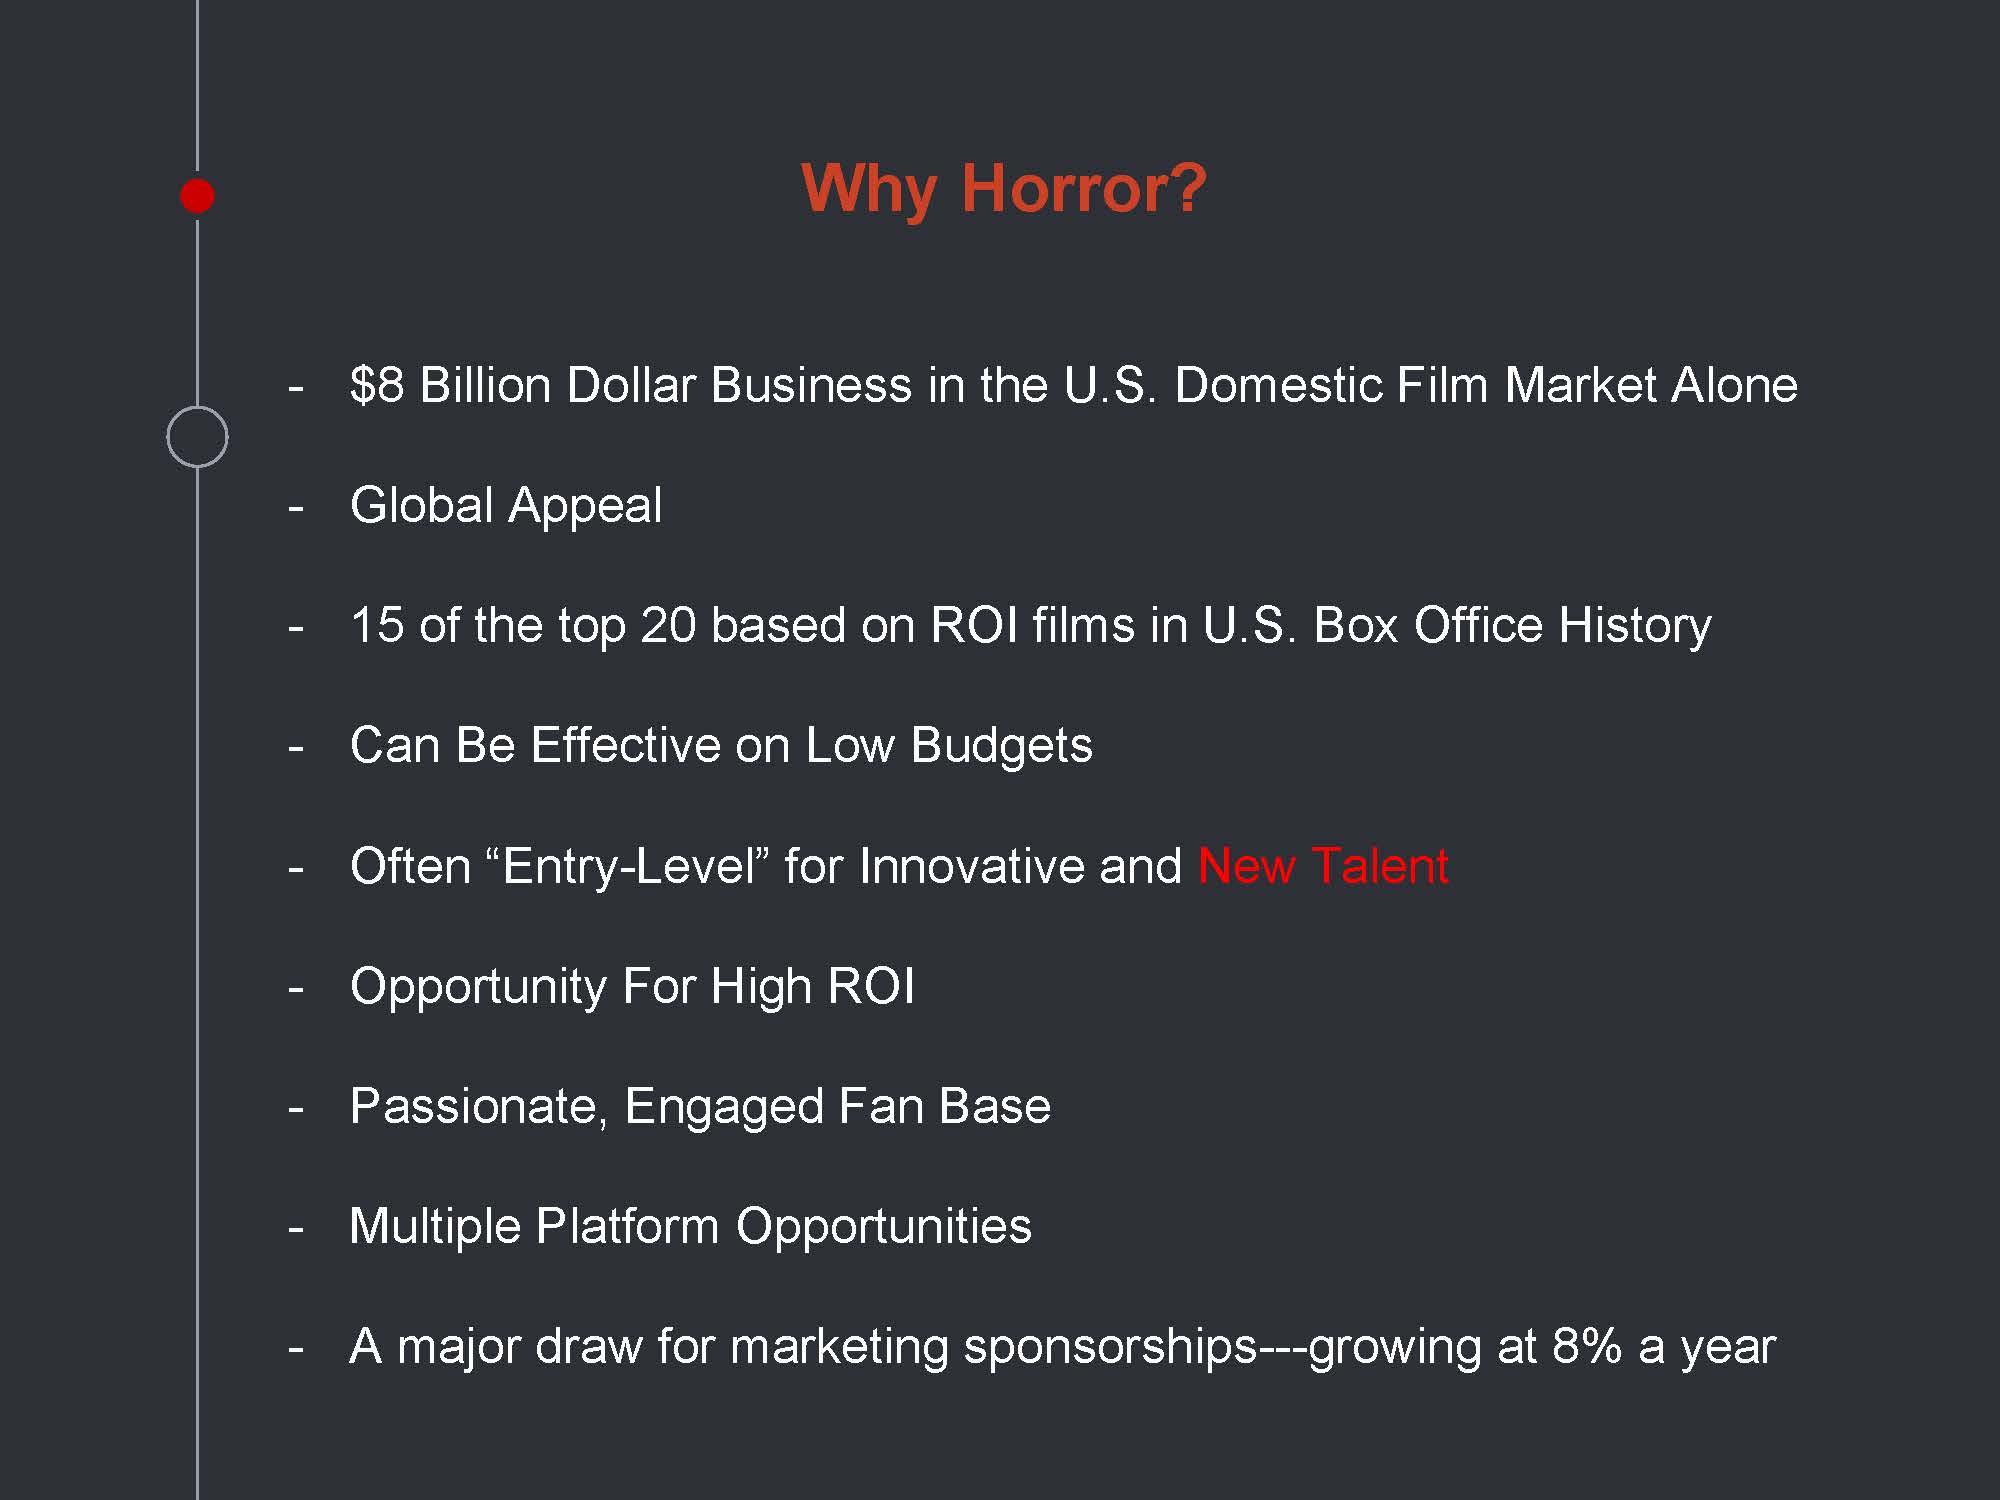 REVISED V20 -HorrorEquityFund 1 Min Sponsor Pitch Deck FINAL JPG 2017_Page_12.jpg